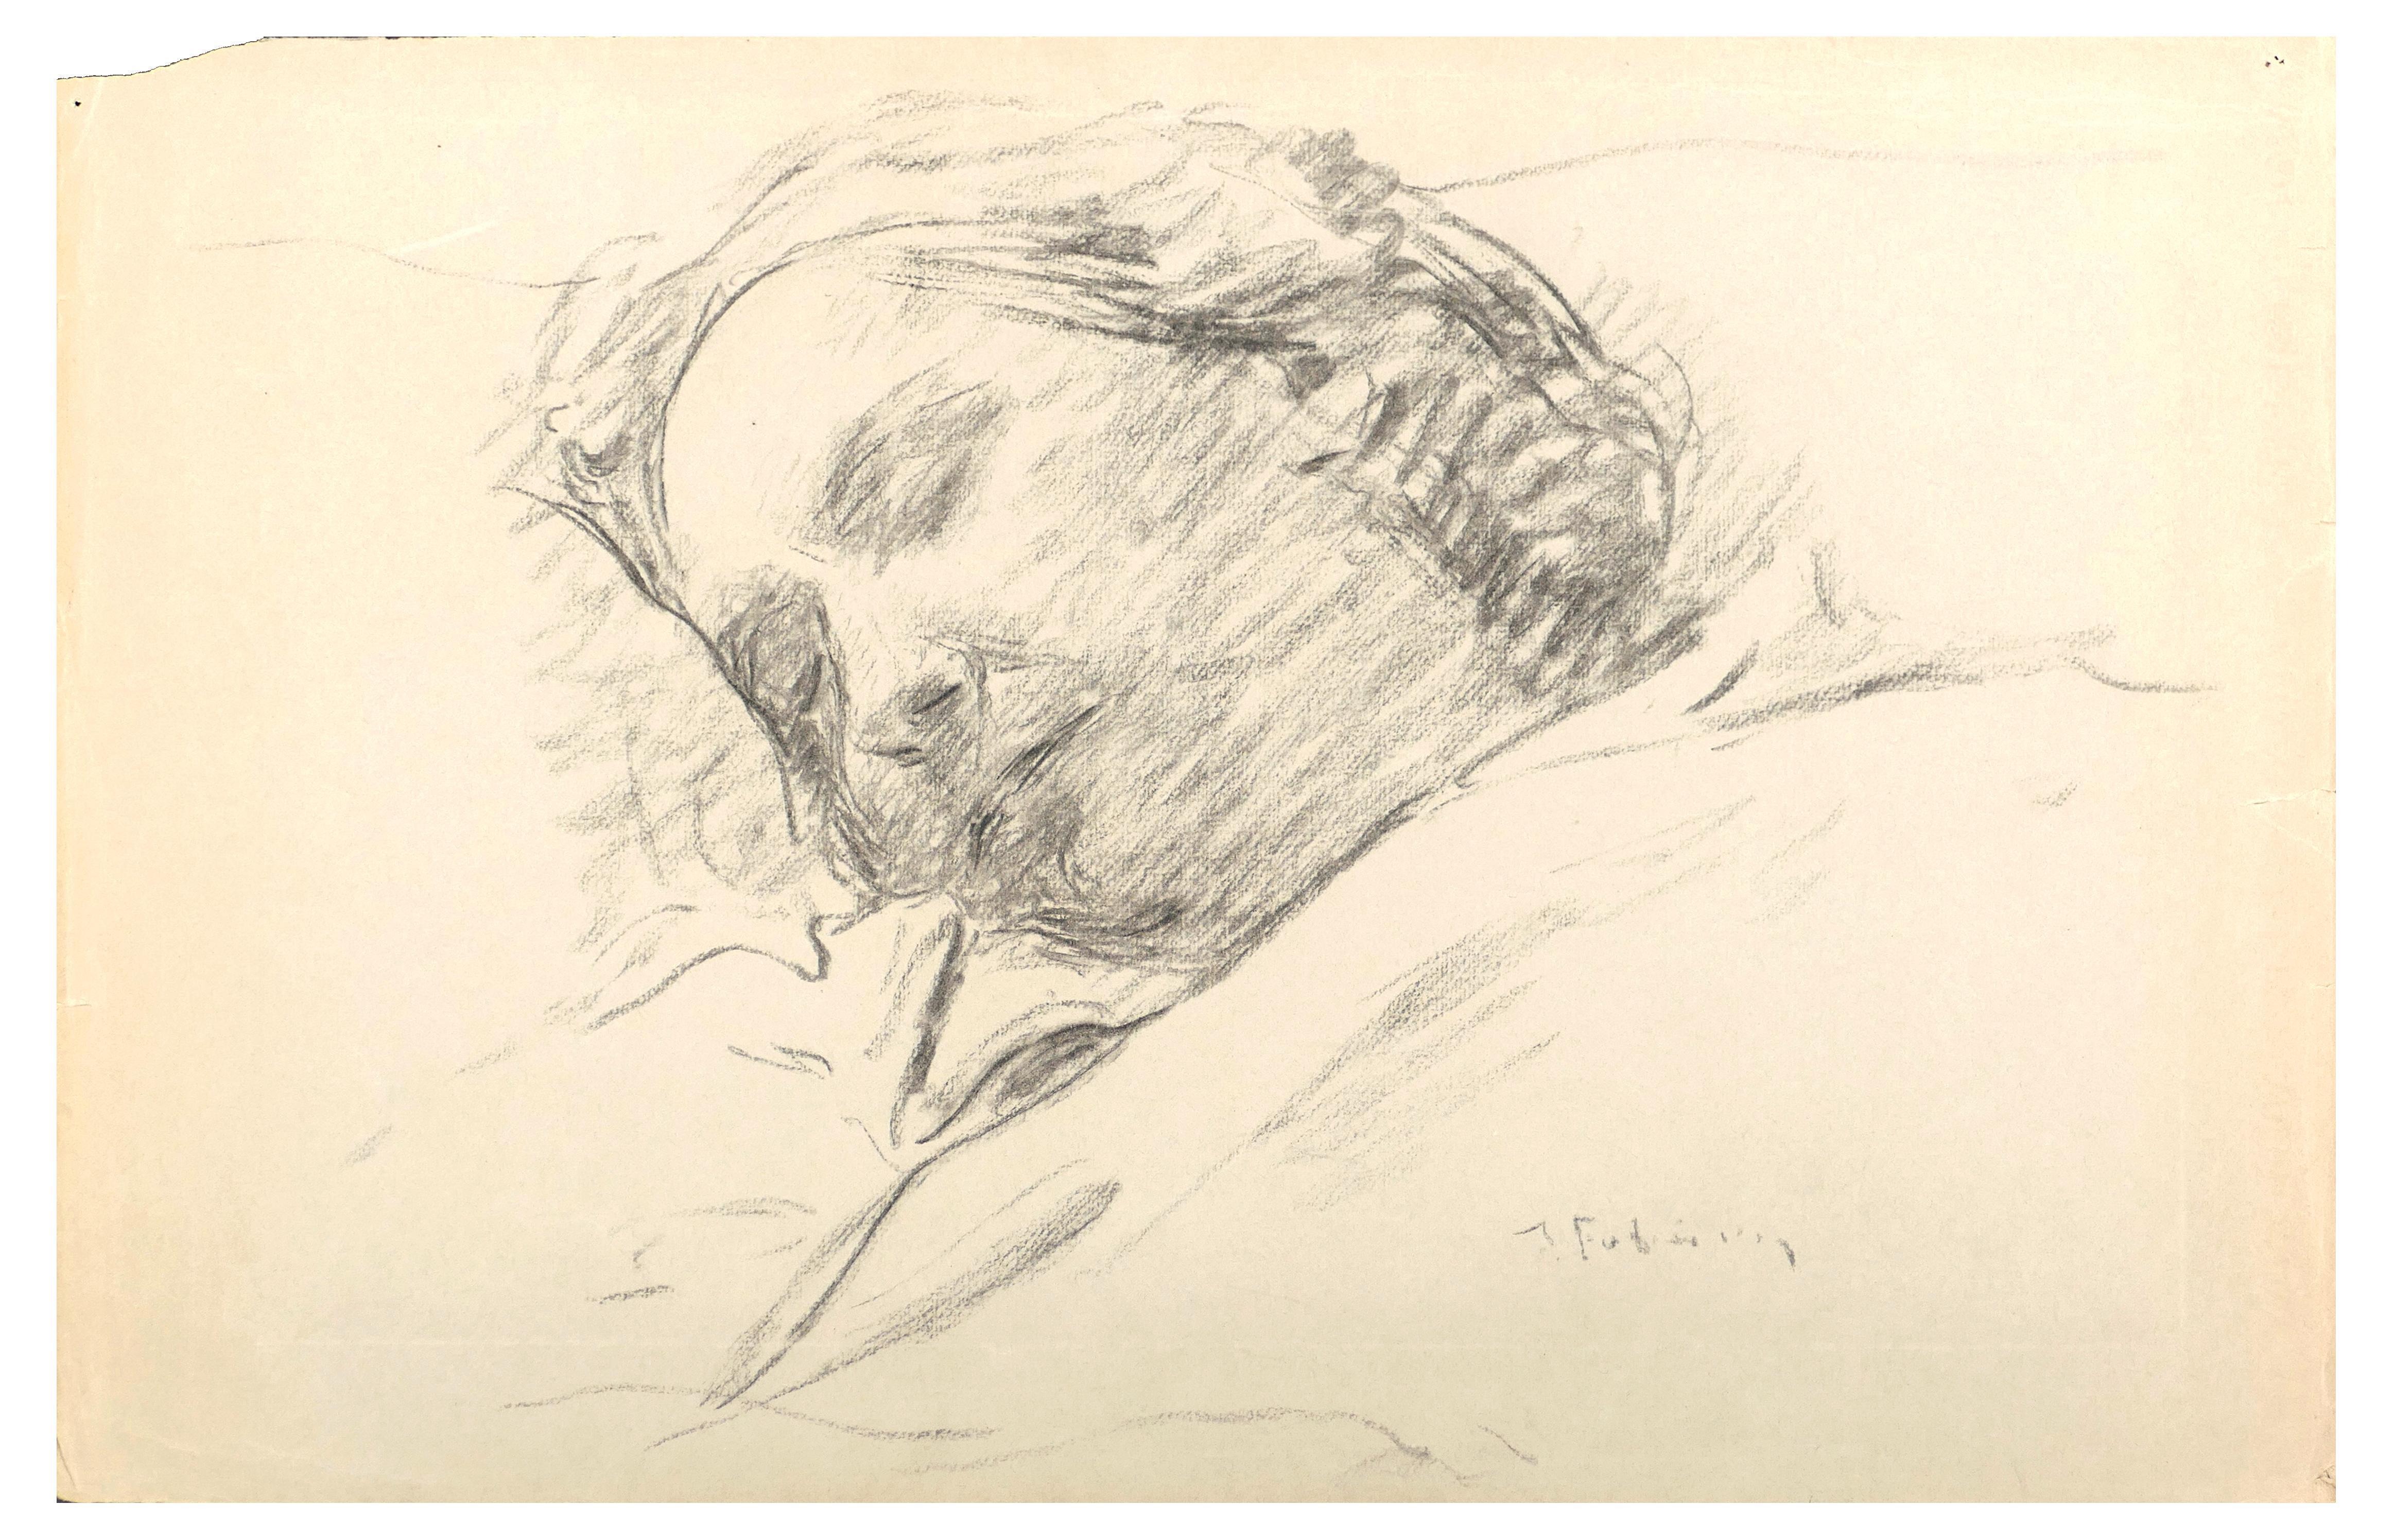 Sleeping Woman - Original Charcoal Drawing by Serge Fontinsky - 1940s